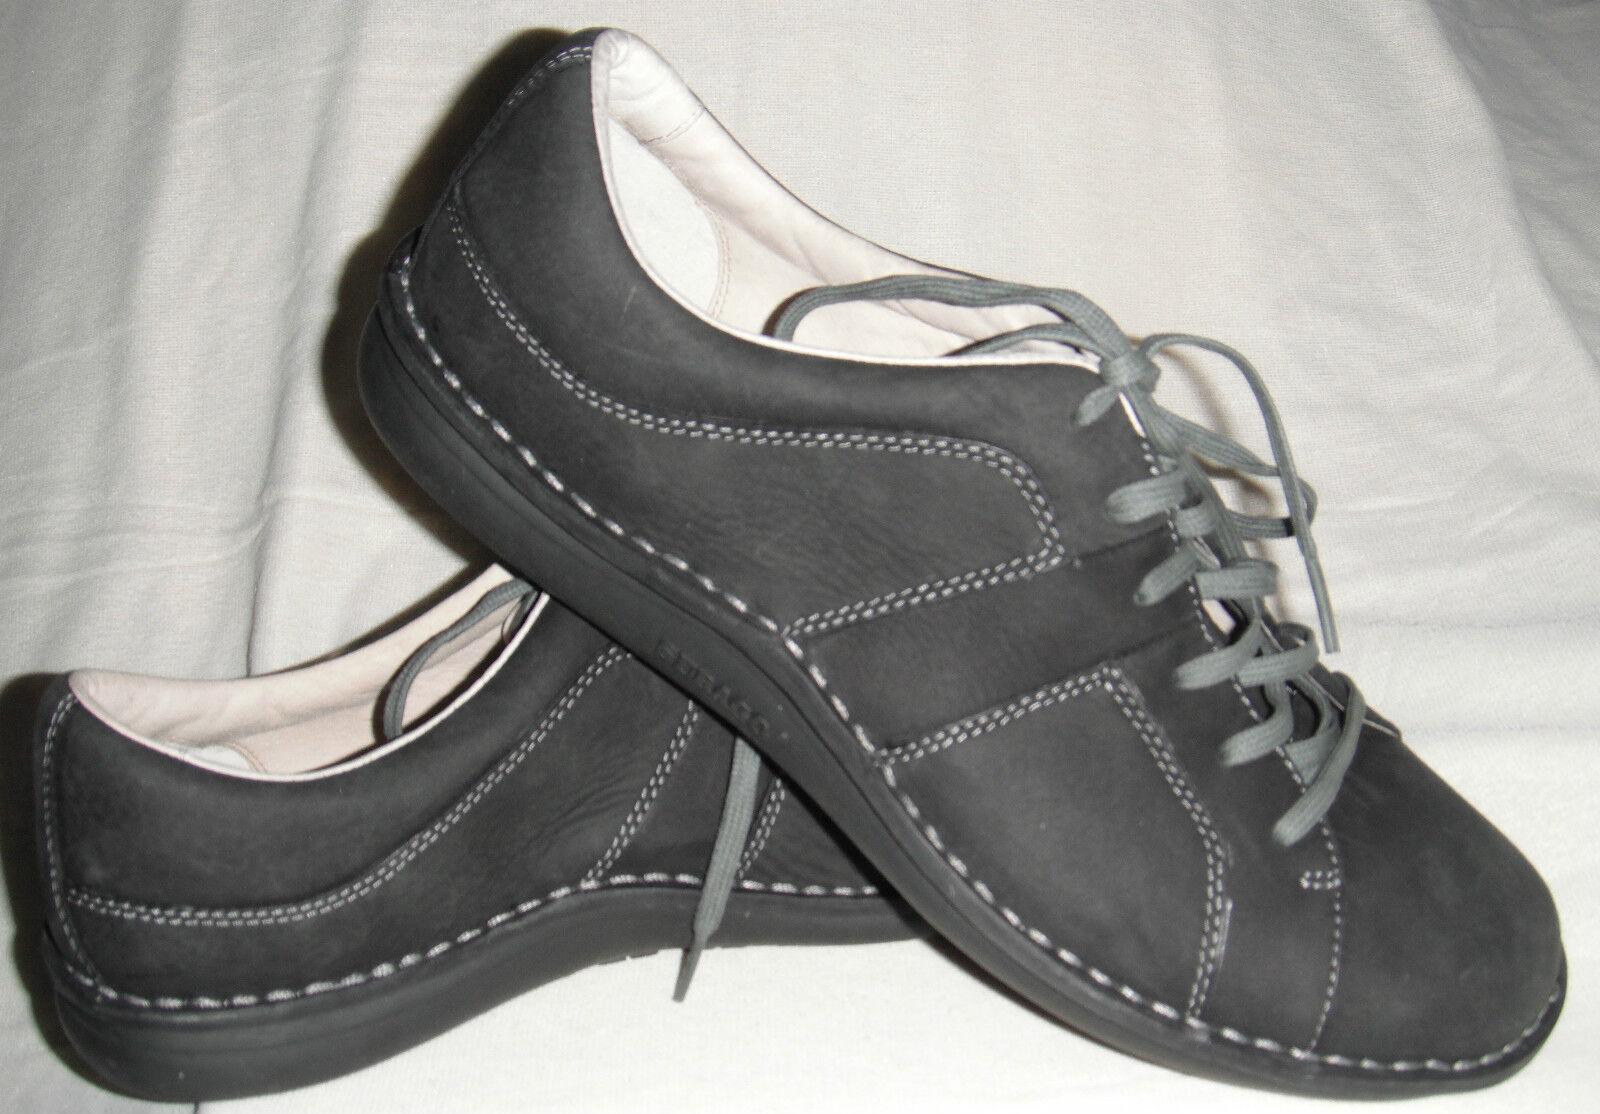 Scarpe casual da uomo Sebago uomos Lace To Toe Oxfords Nubuk Shoes sz 8M 0